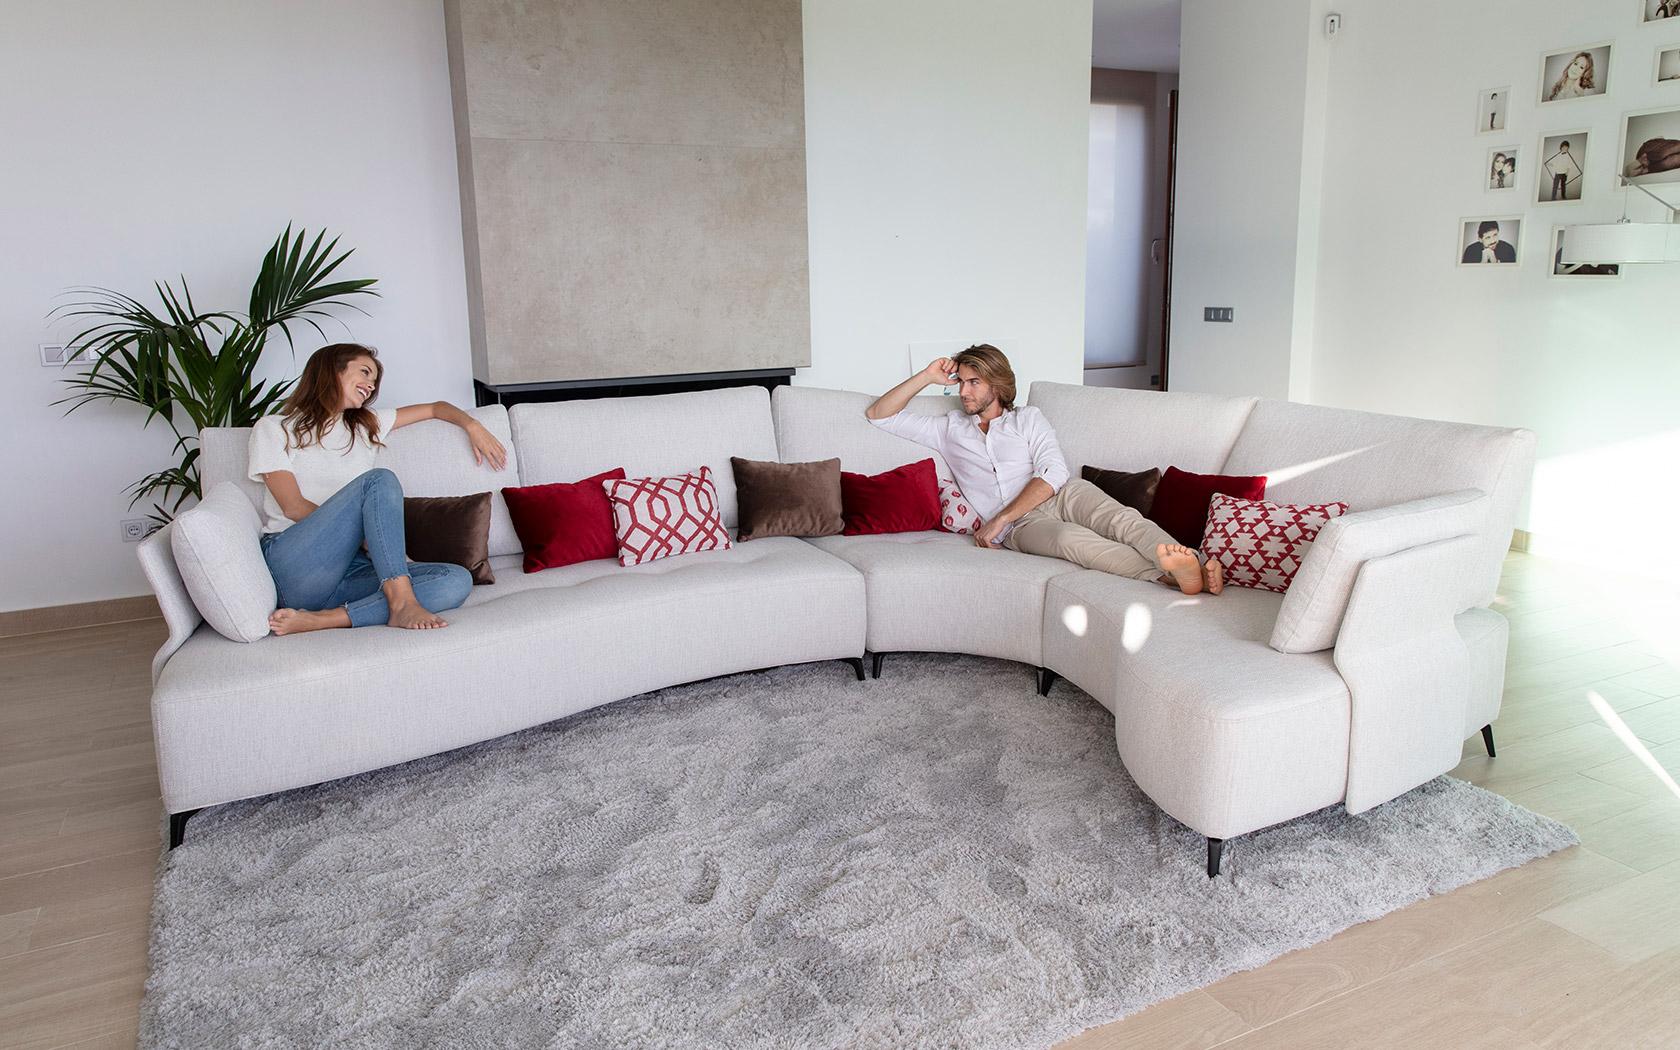 kalahari sofa 2021 08